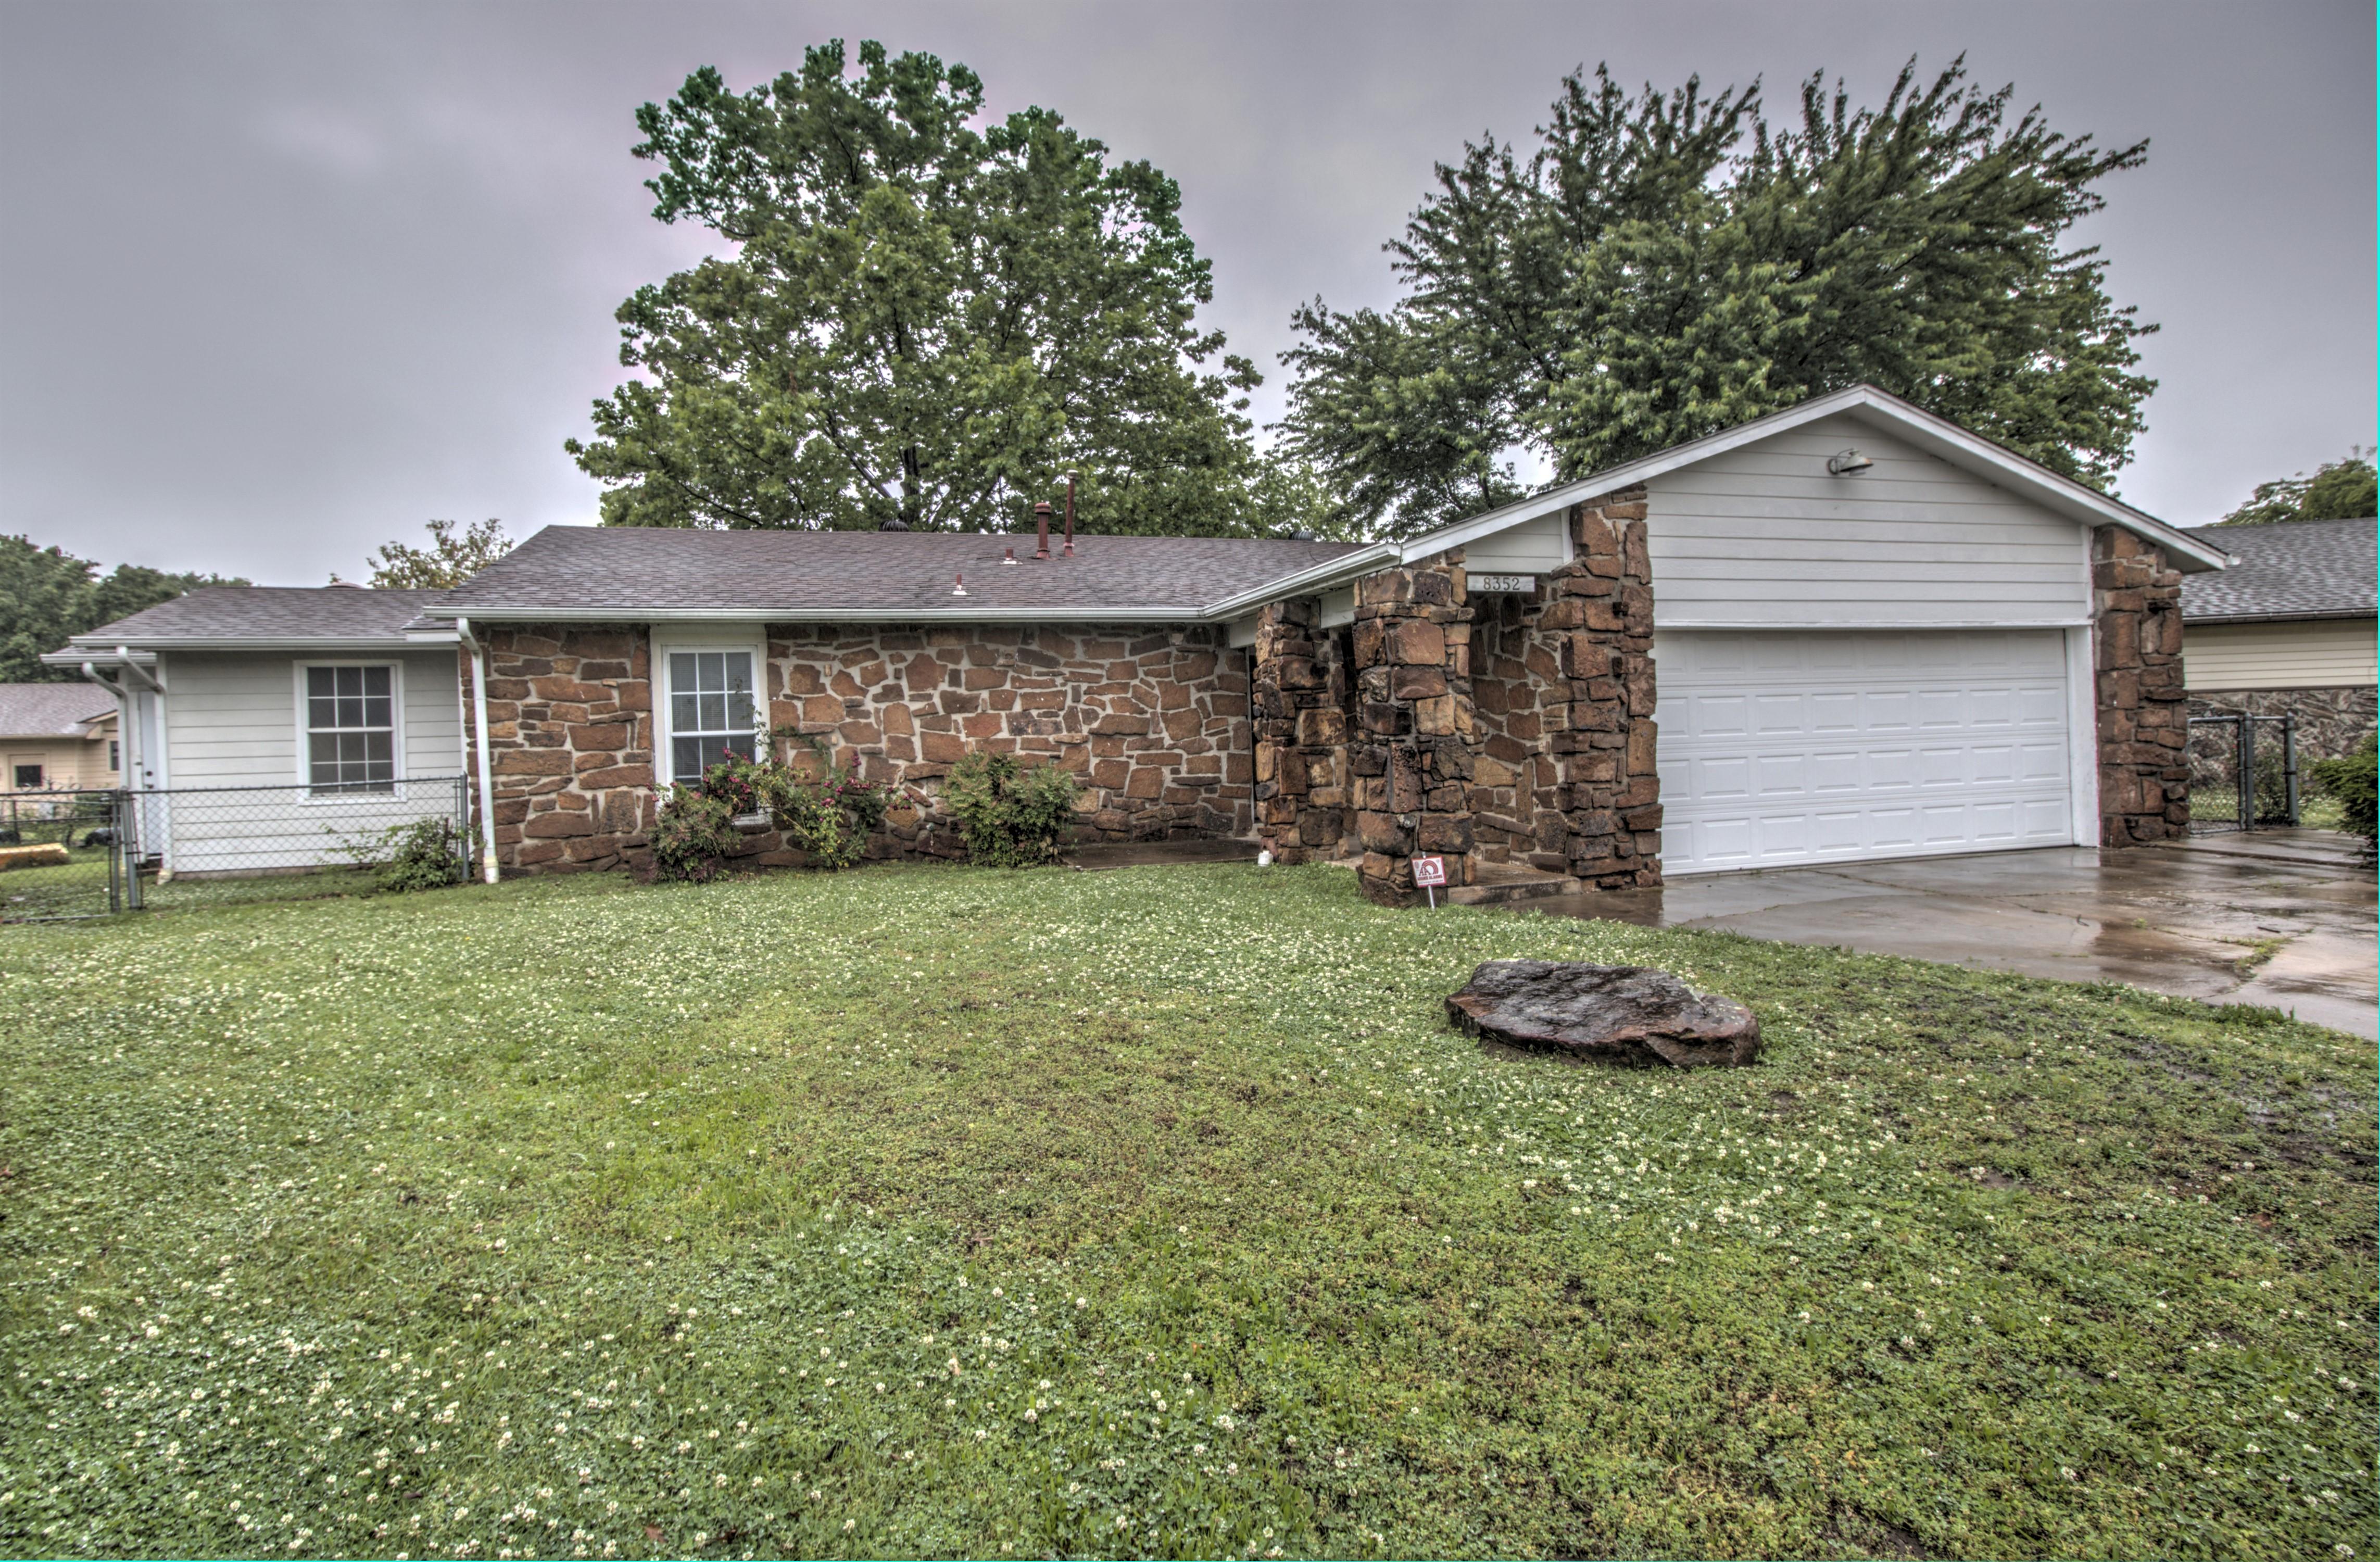 8352 N 120th East Avenue Property Photo 1